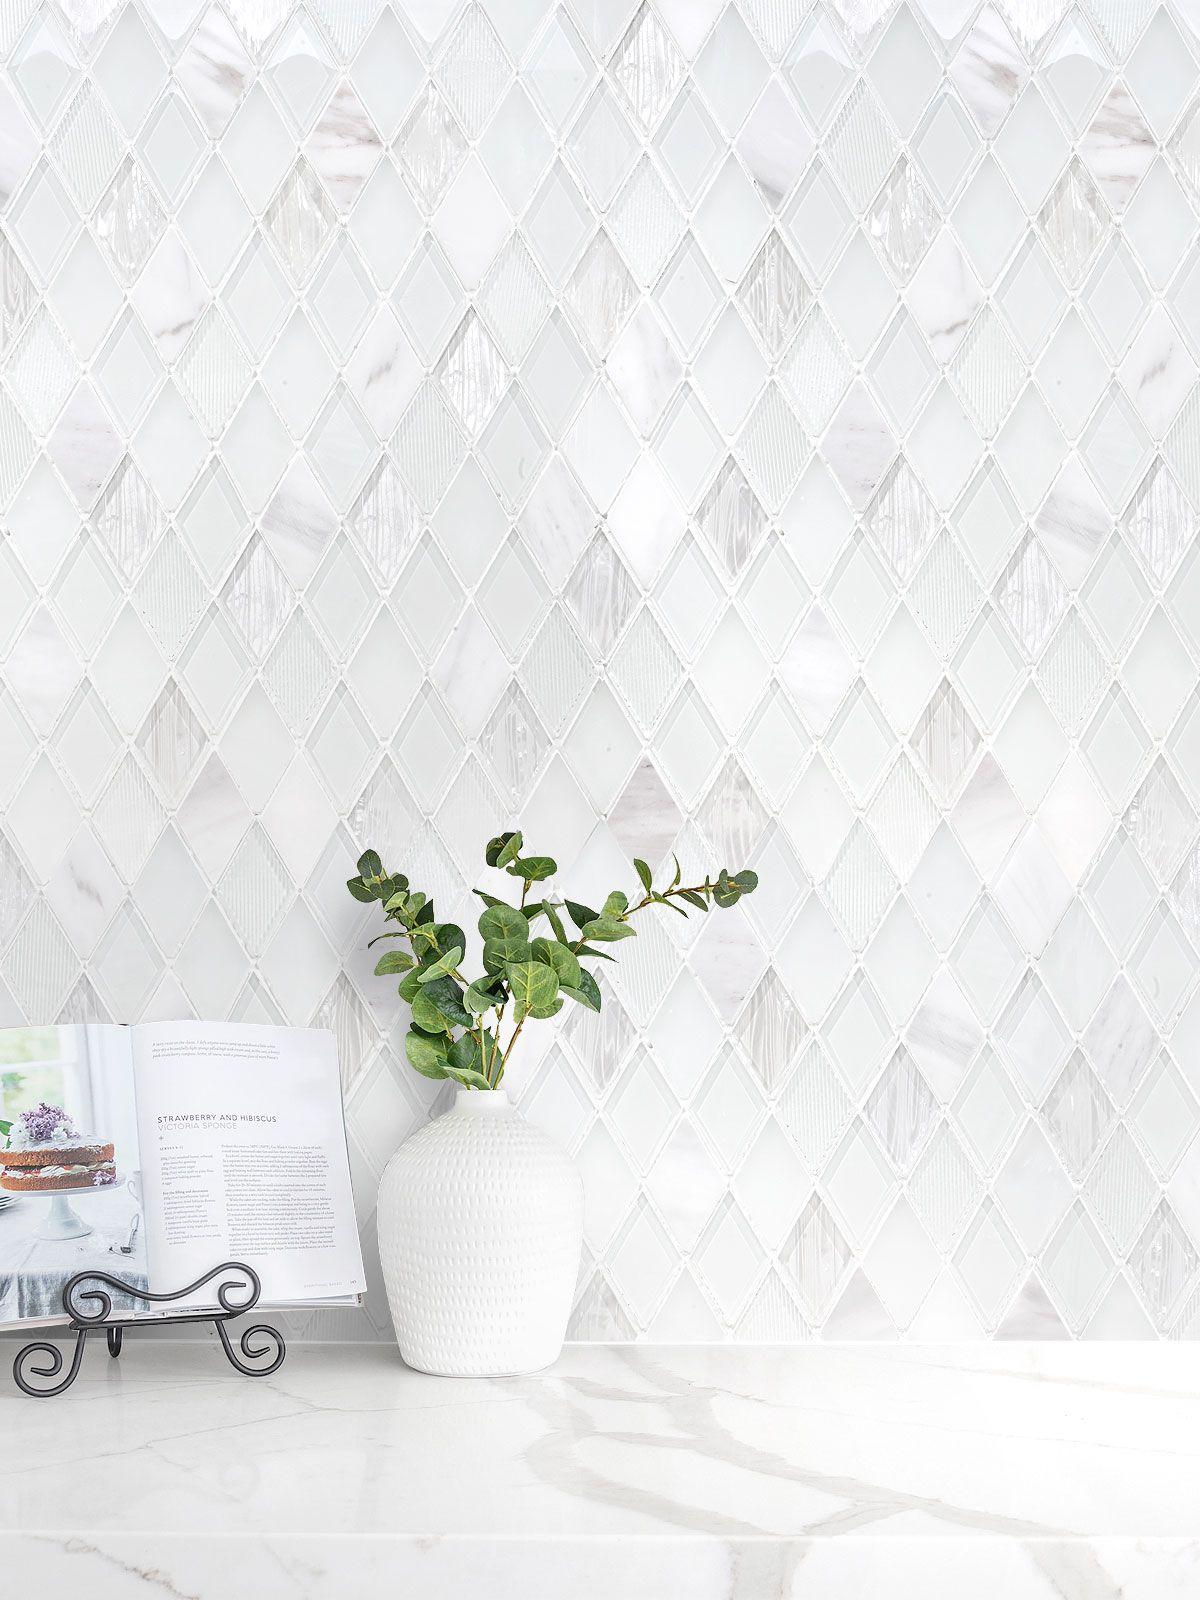 The elegant glass and marble mix rhomboid design backsplash tile from Backsplash.com